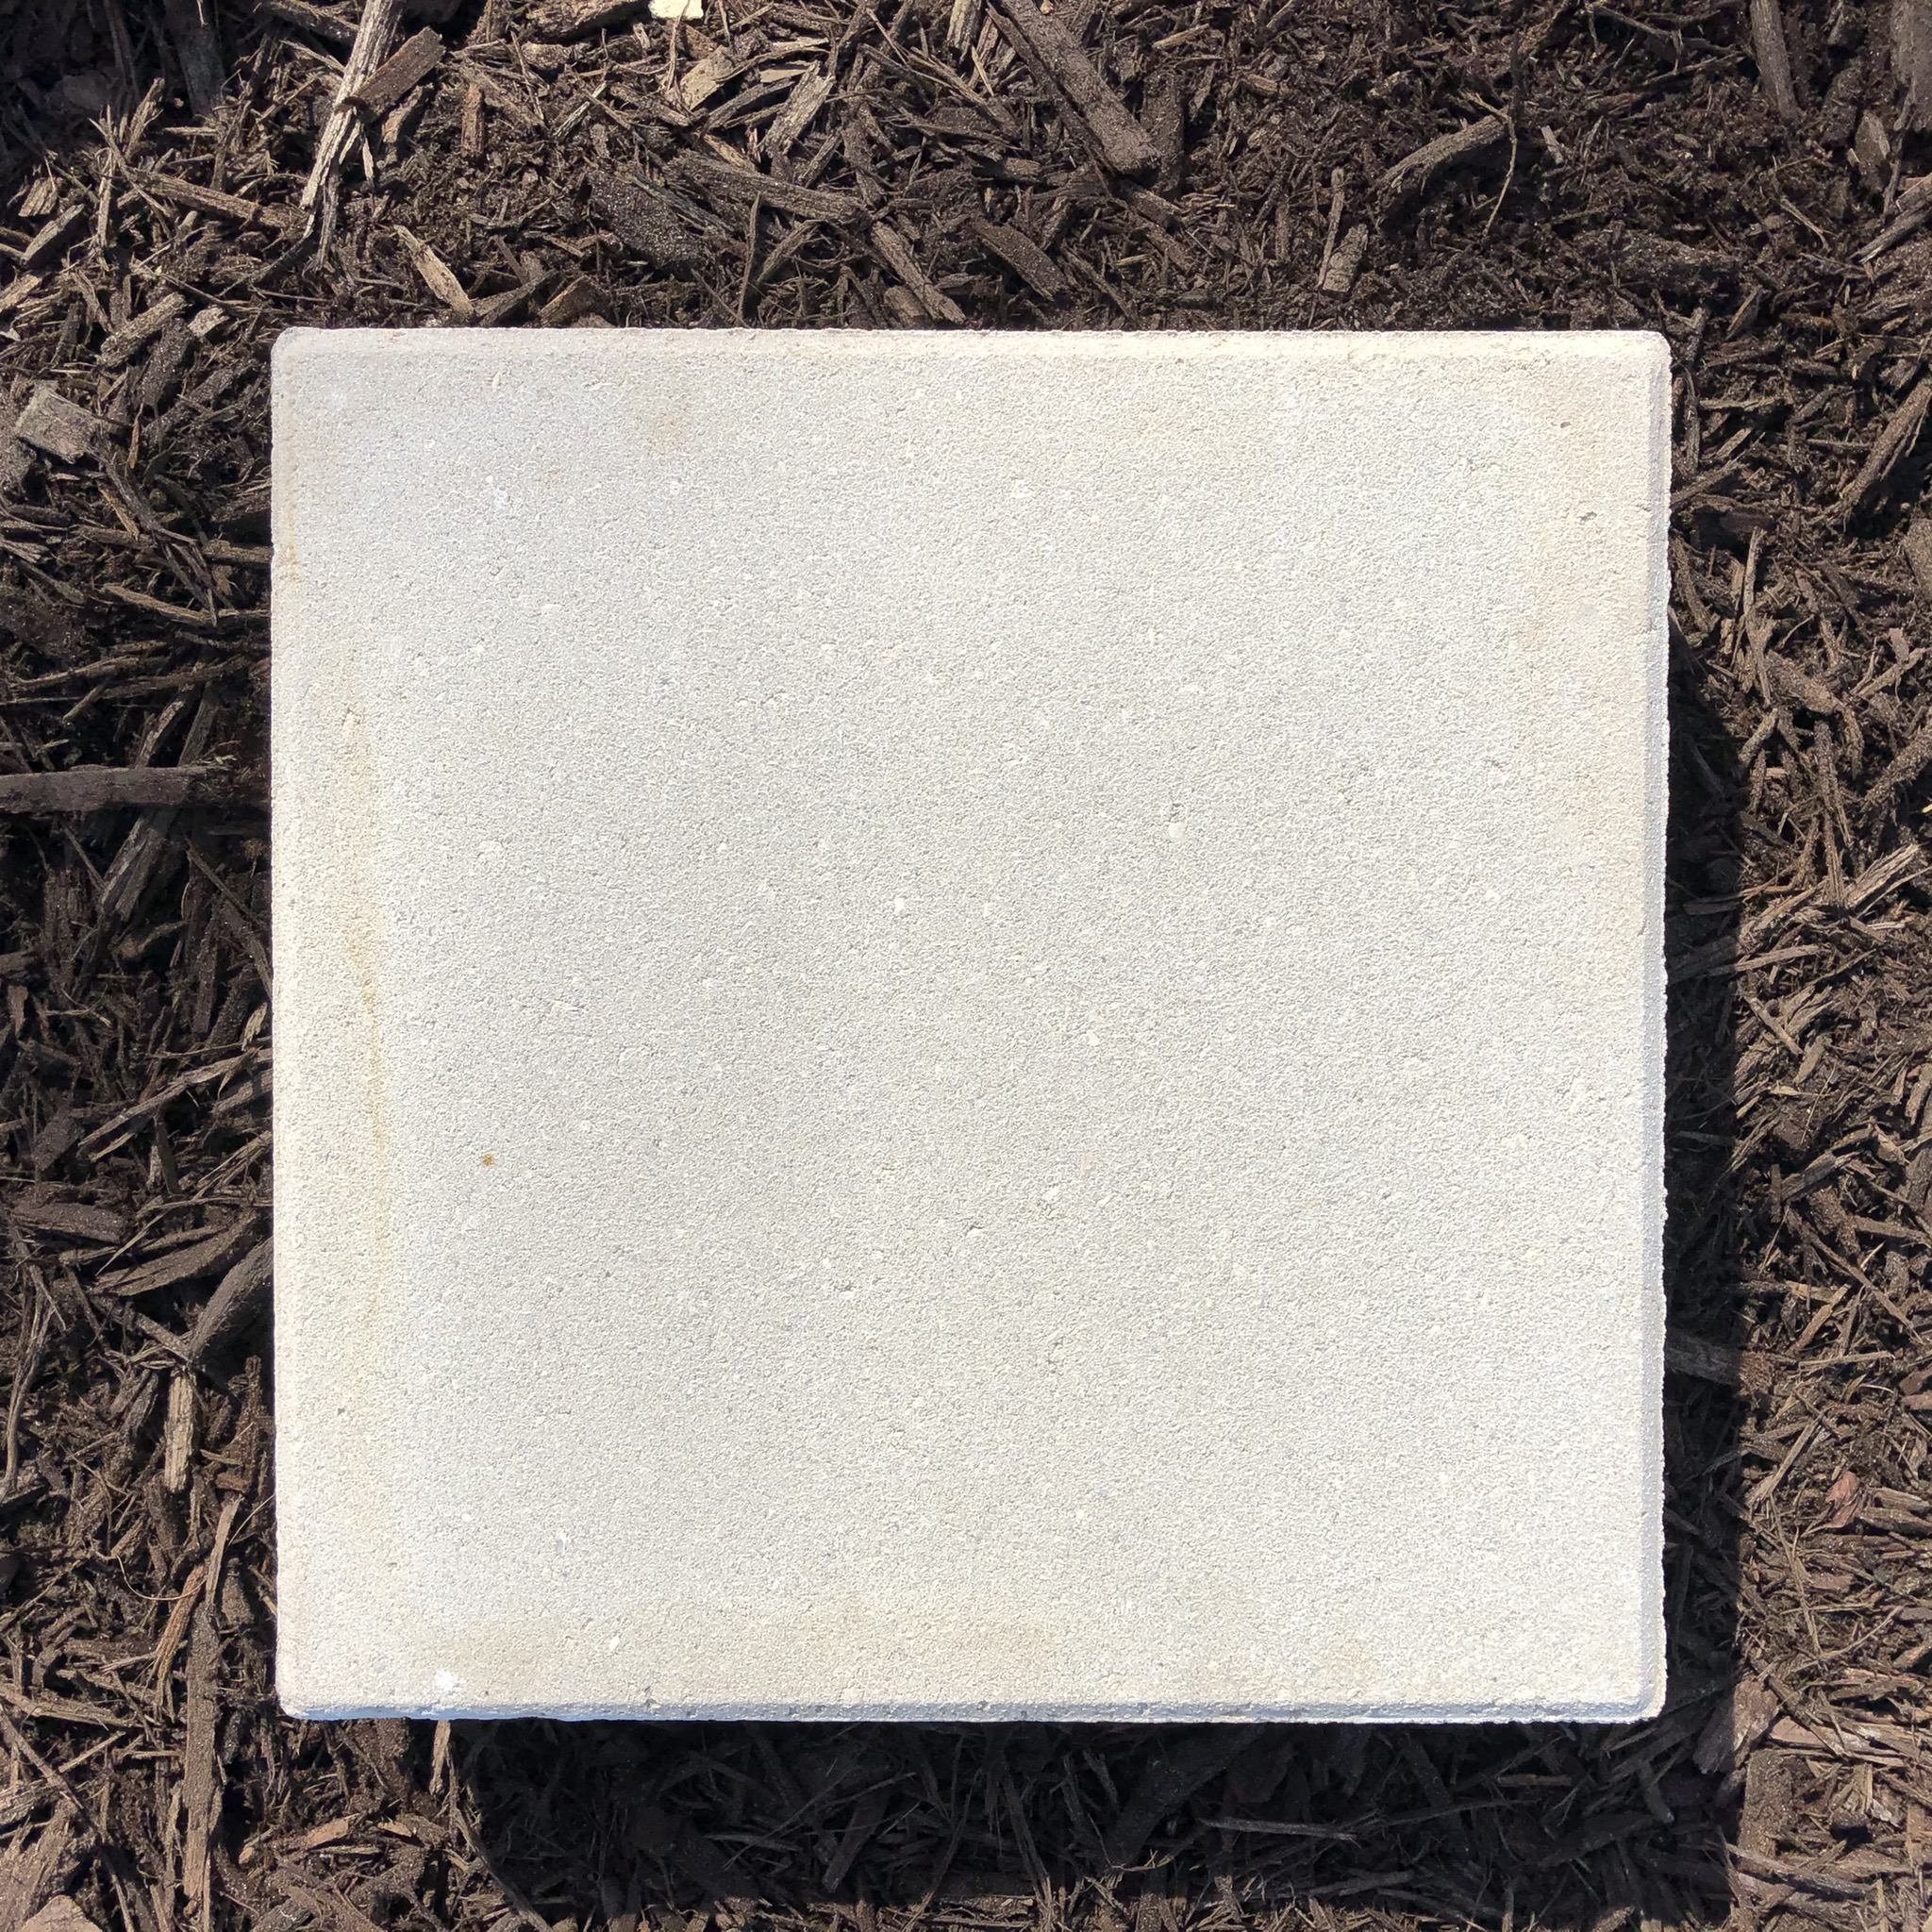 stone 24 x 24 square white